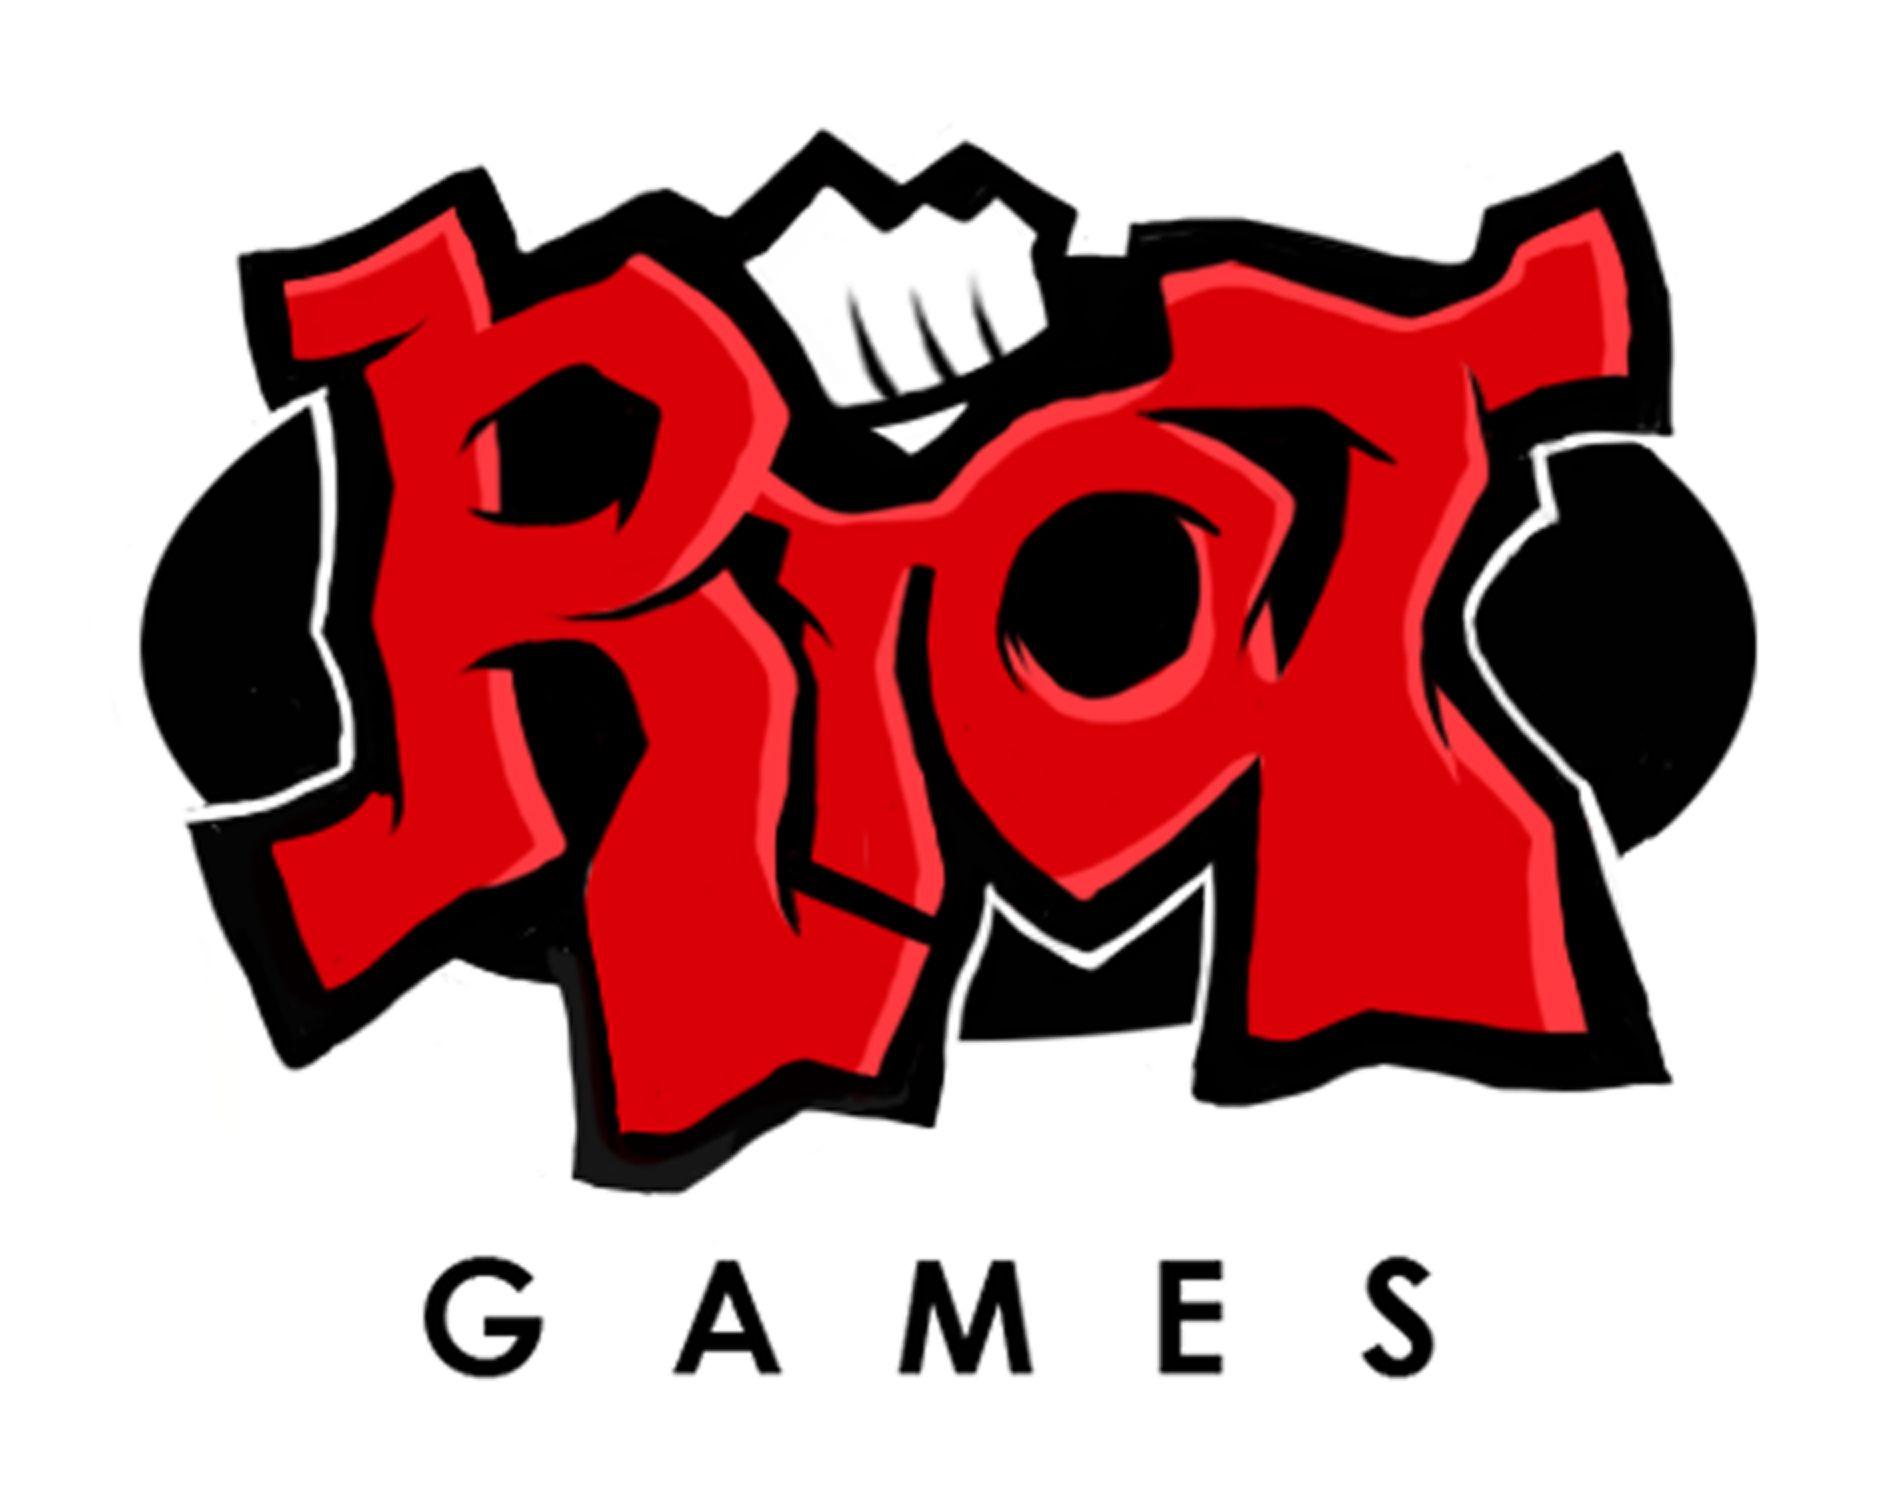 games logo Recherche Google game & logo Pinterest